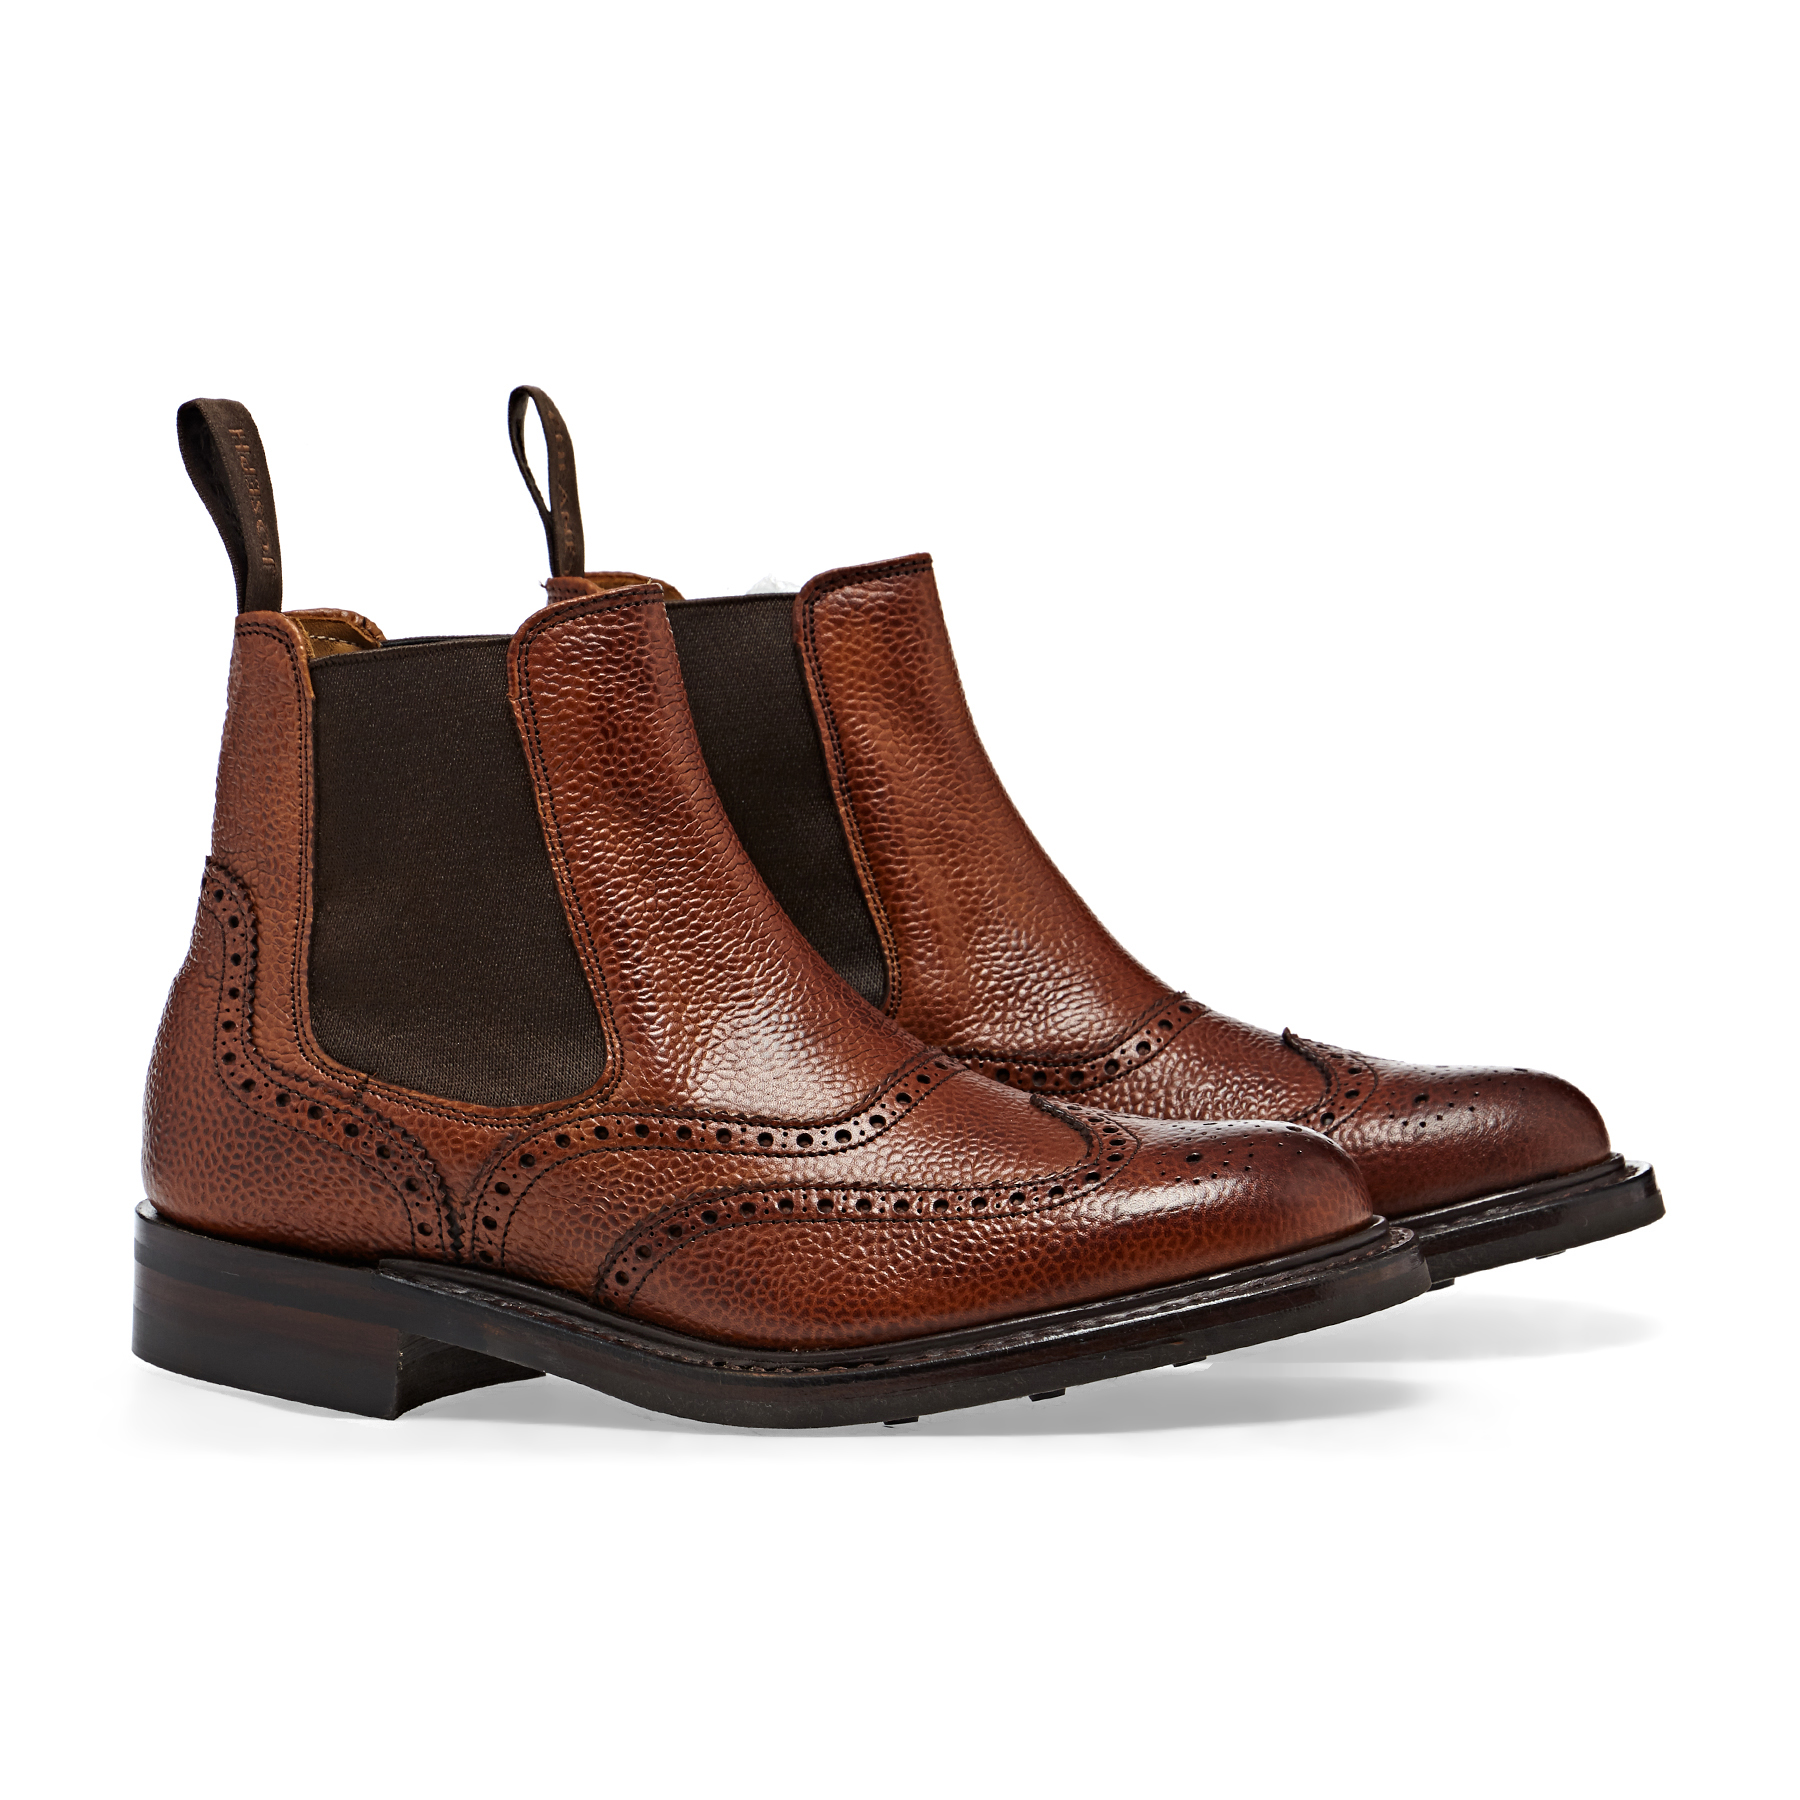 Cheaney Shoes \u0026 Boots for Men \u0026 Women